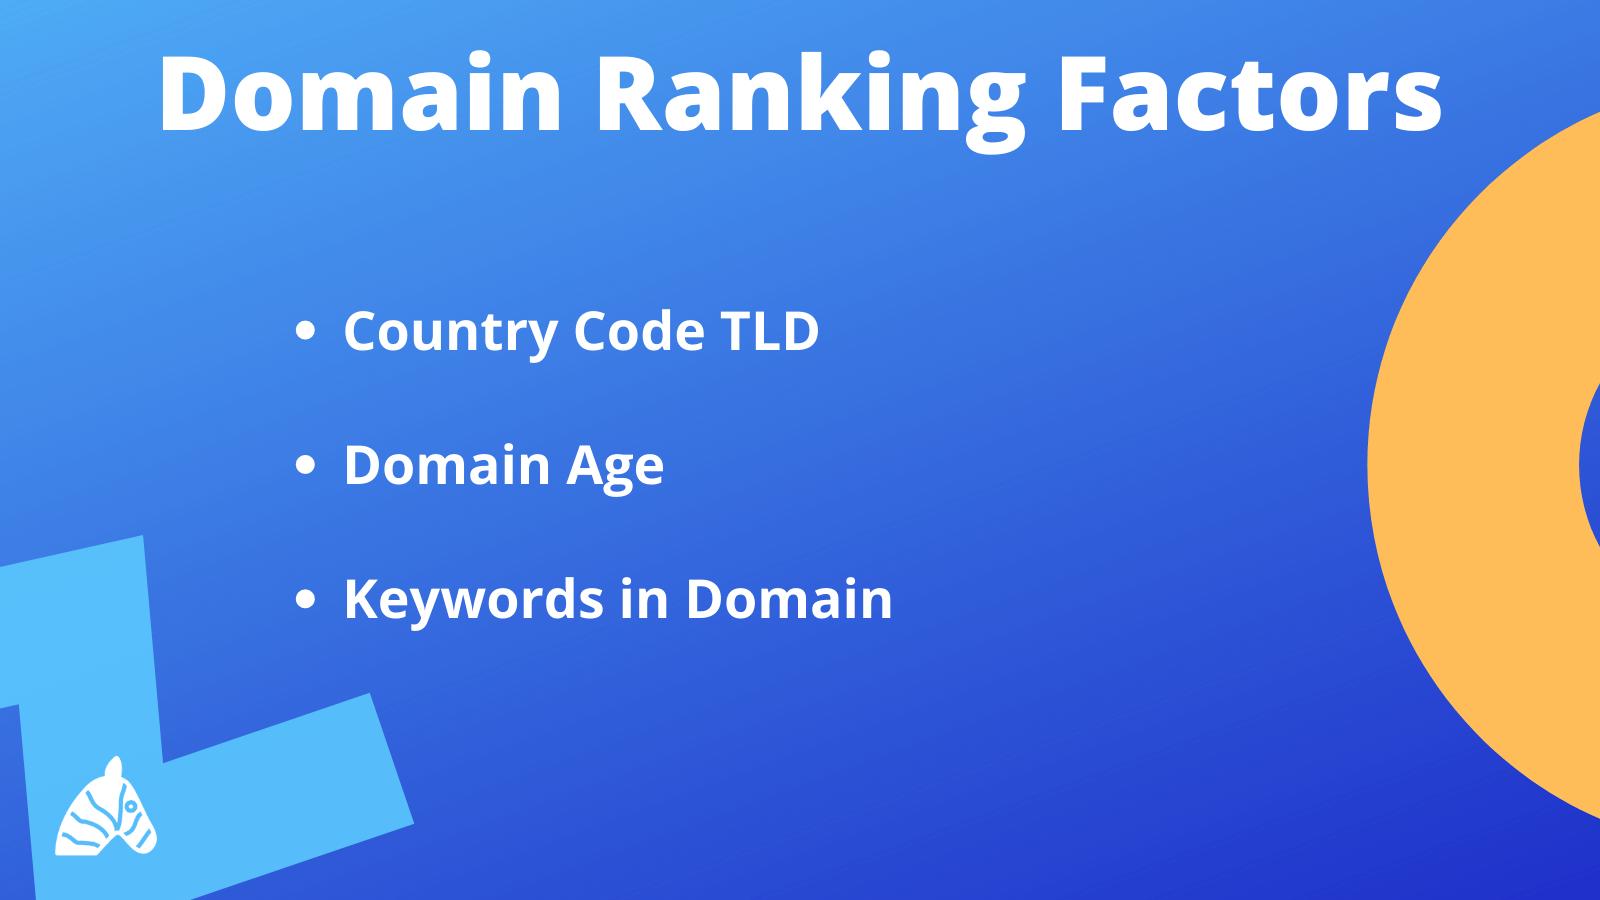 domain level ranking factors